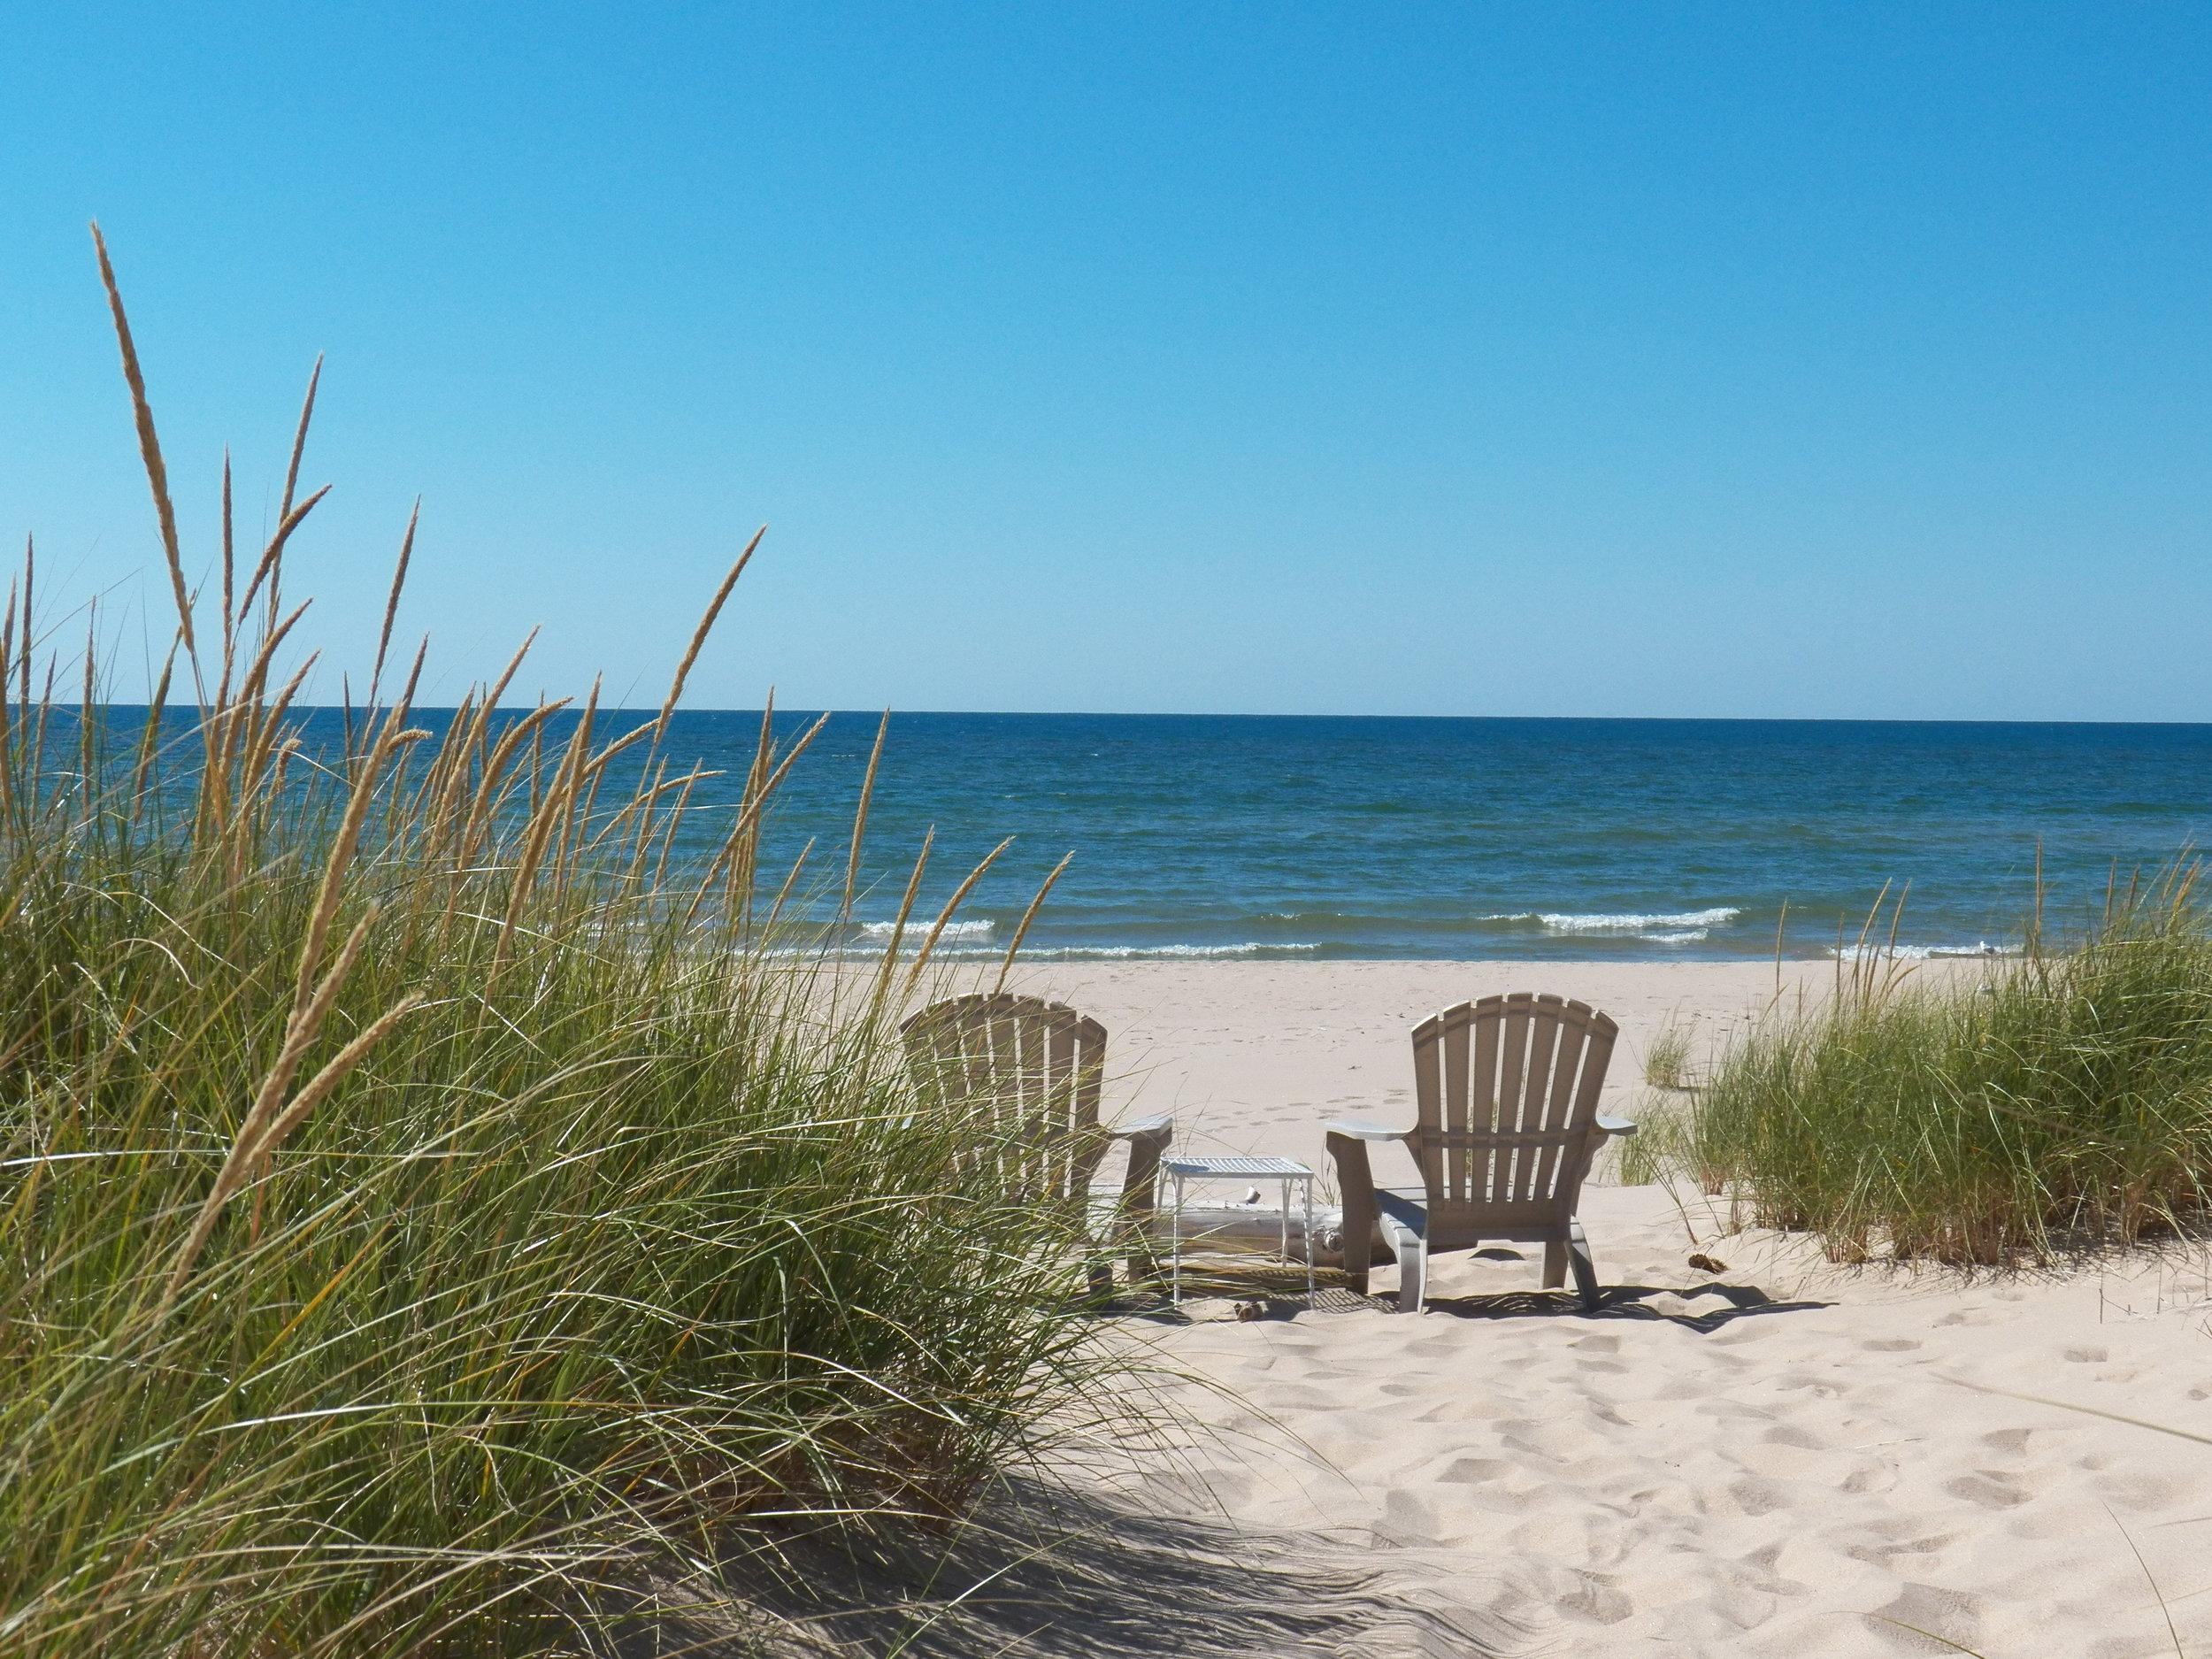 Chairs along the Lake Michigan shoreline.